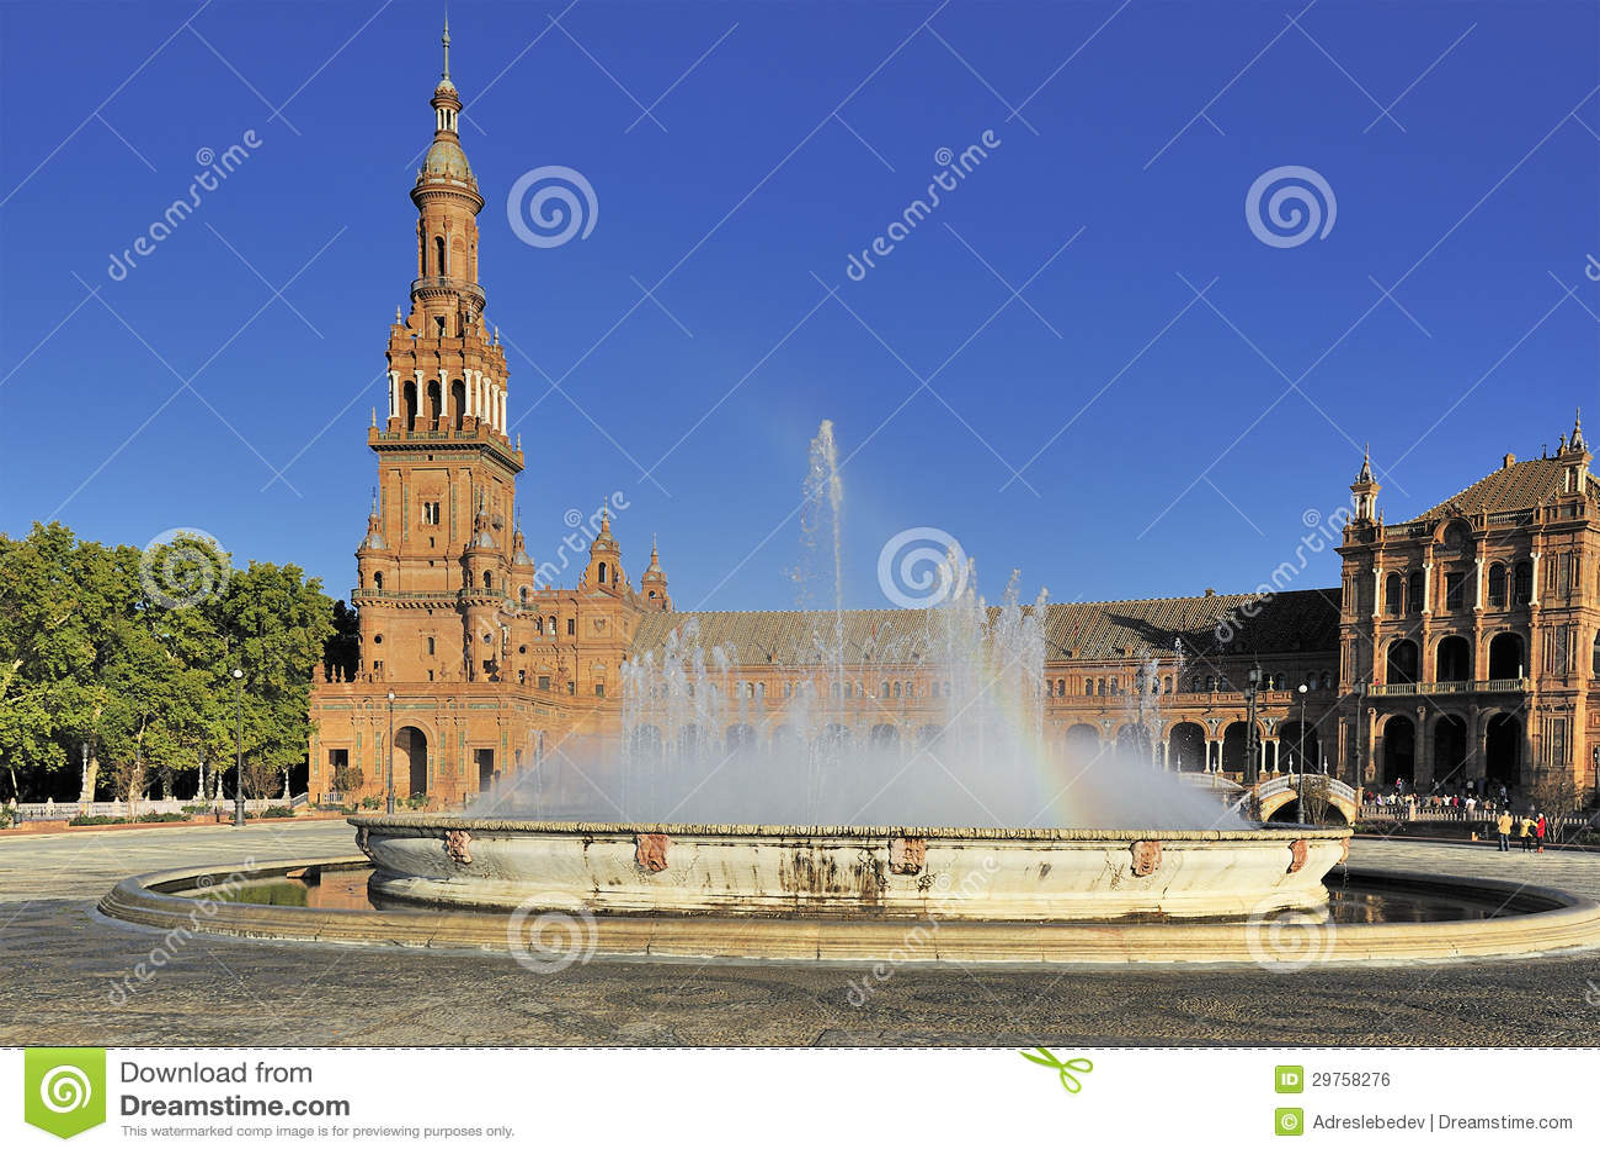 Plaza de Espana (Spanien kvadrerar), Seville, Spanien